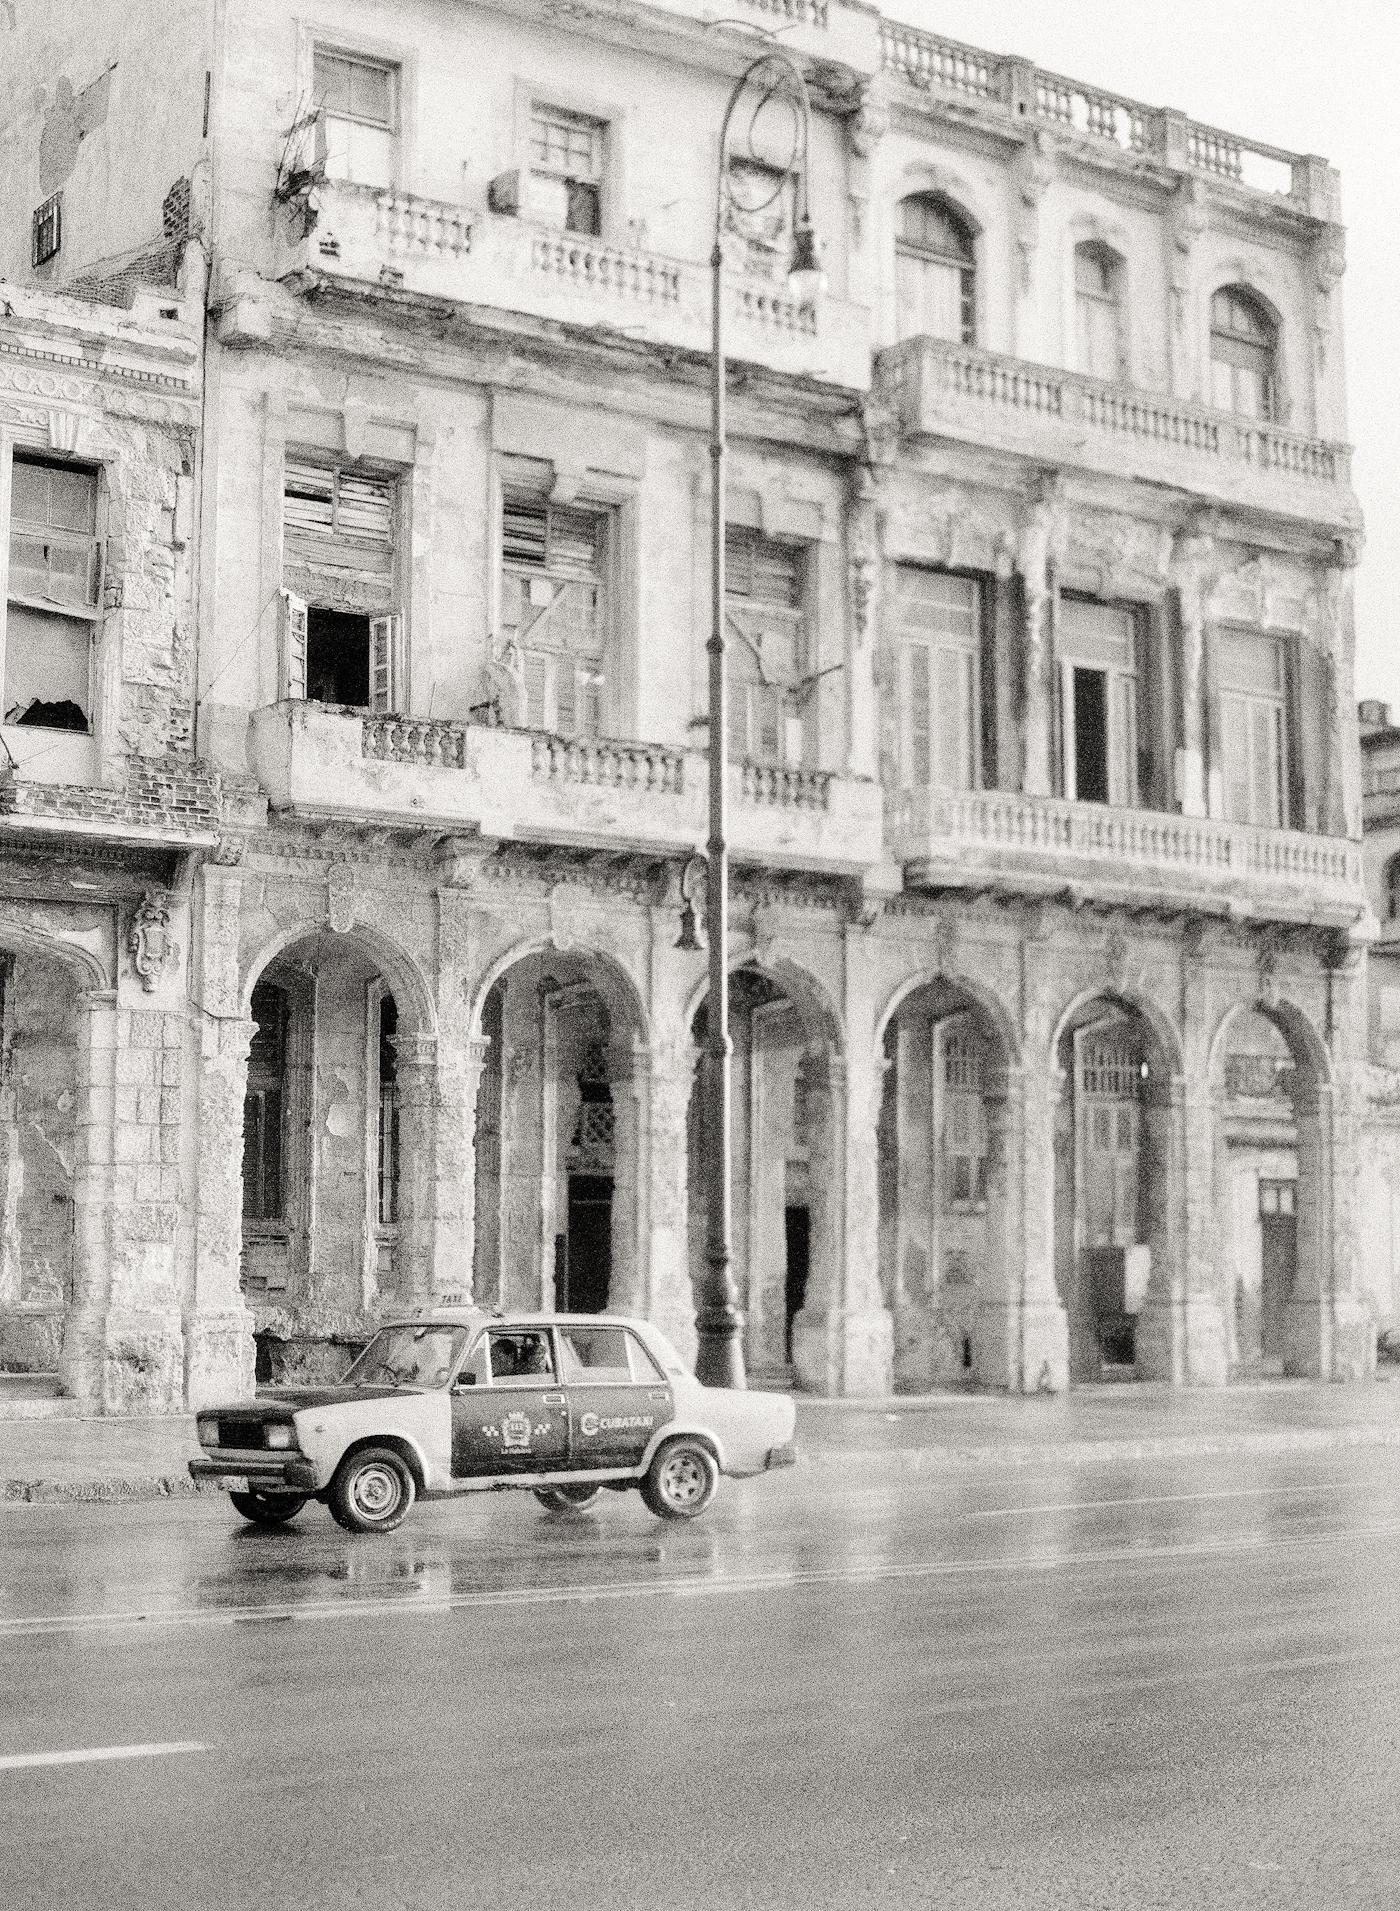 JenHuang-Cuba2016-22-000017930004.jpg